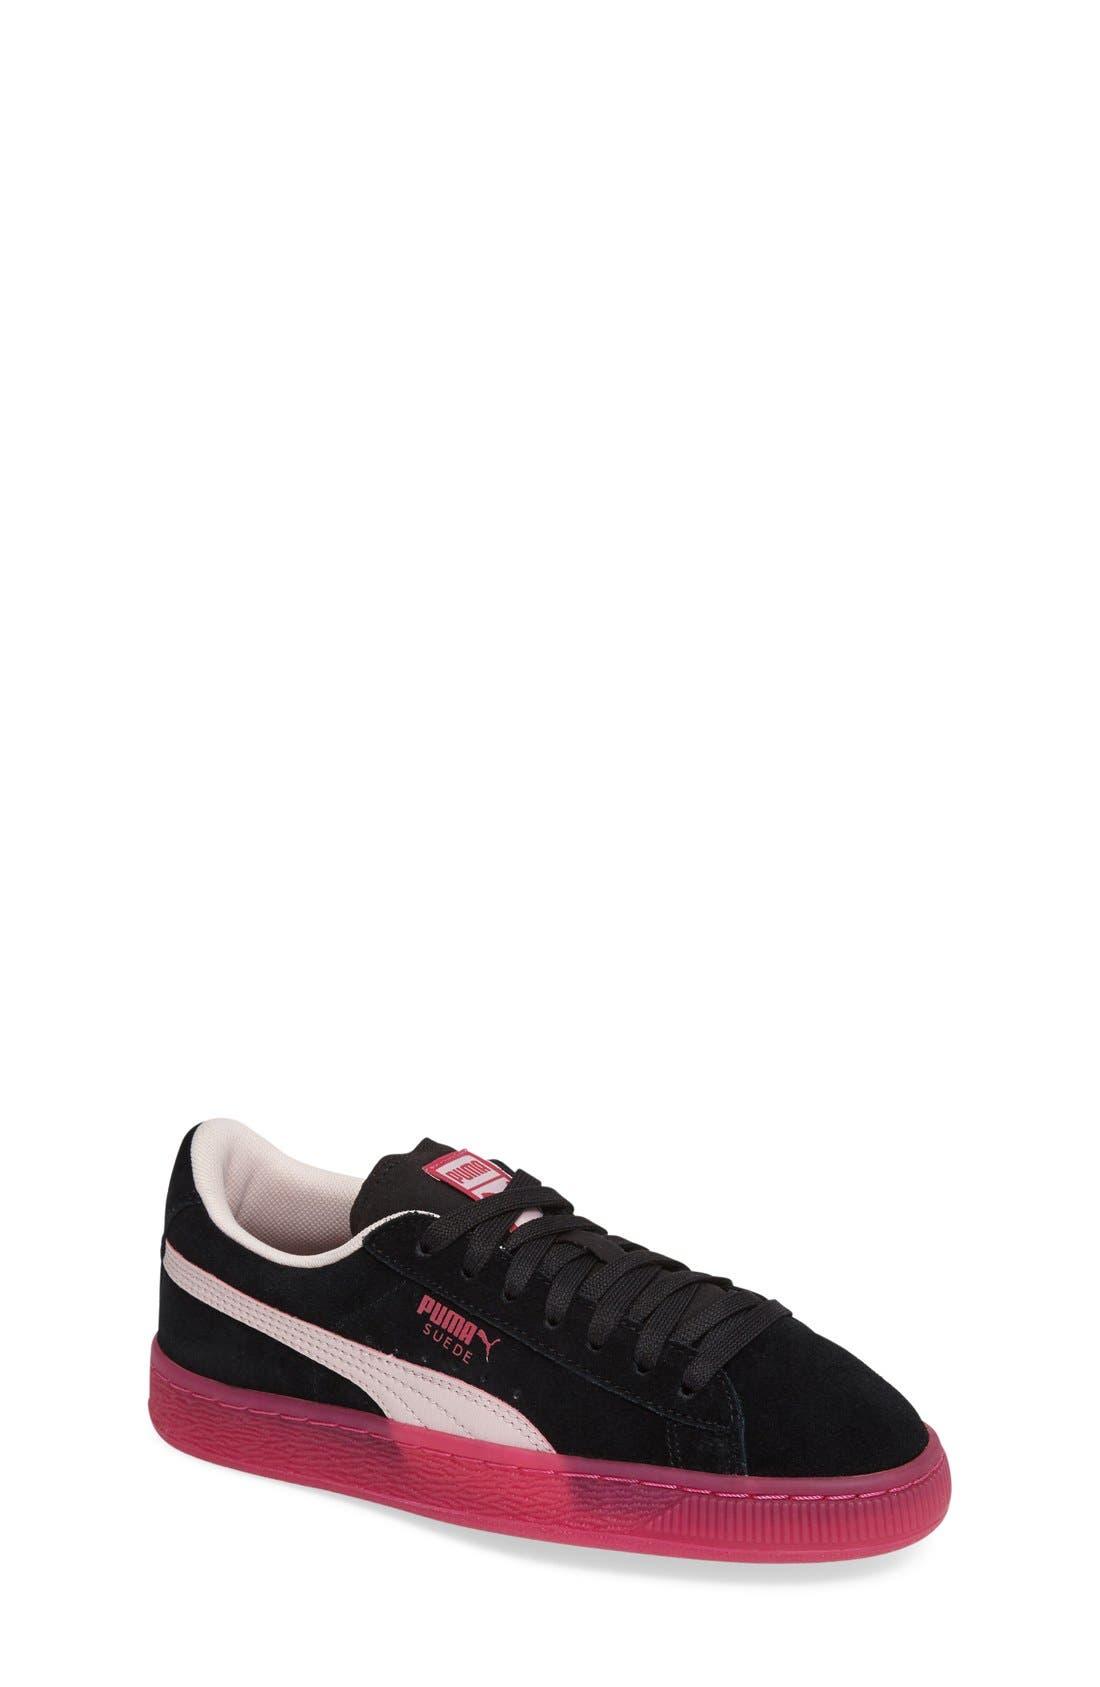 LFS Iced Jr Sneaker,                             Main thumbnail 1, color,                             001